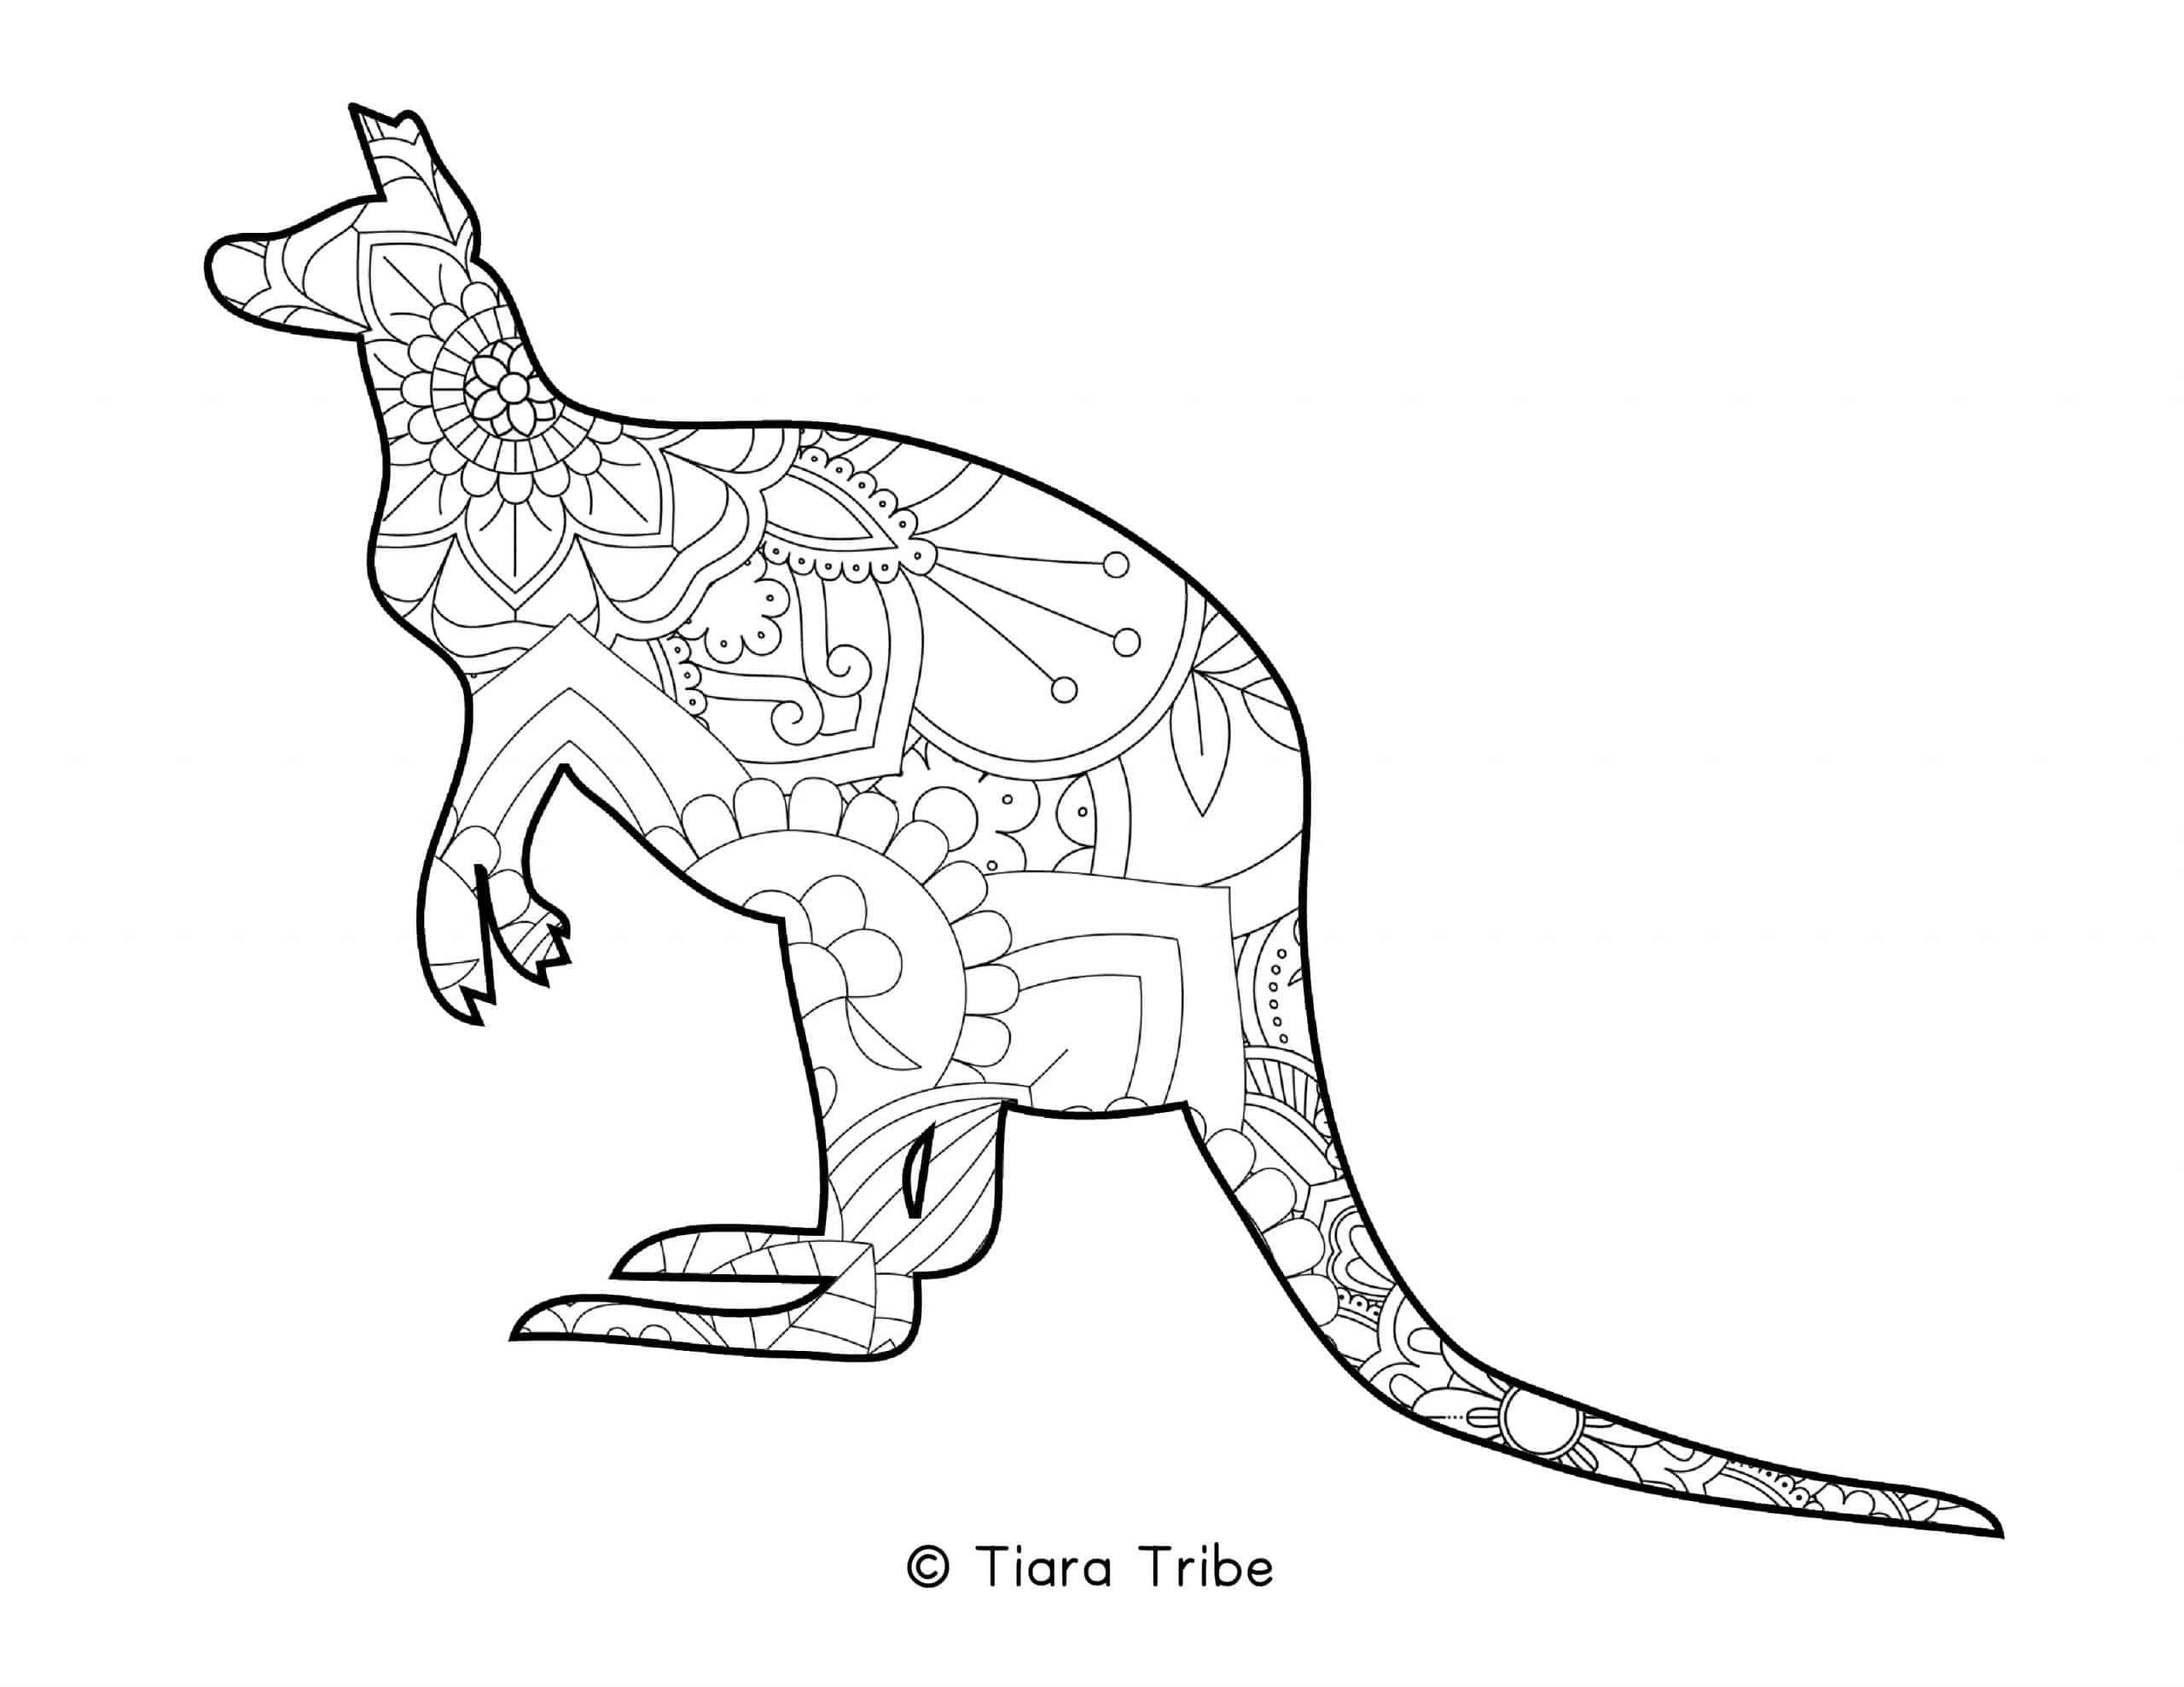 Kangaroo Mandala Coloring Page Mandala Coloring Pages Mandala Coloring Coloring Pages [ 1978 x 2560 Pixel ]